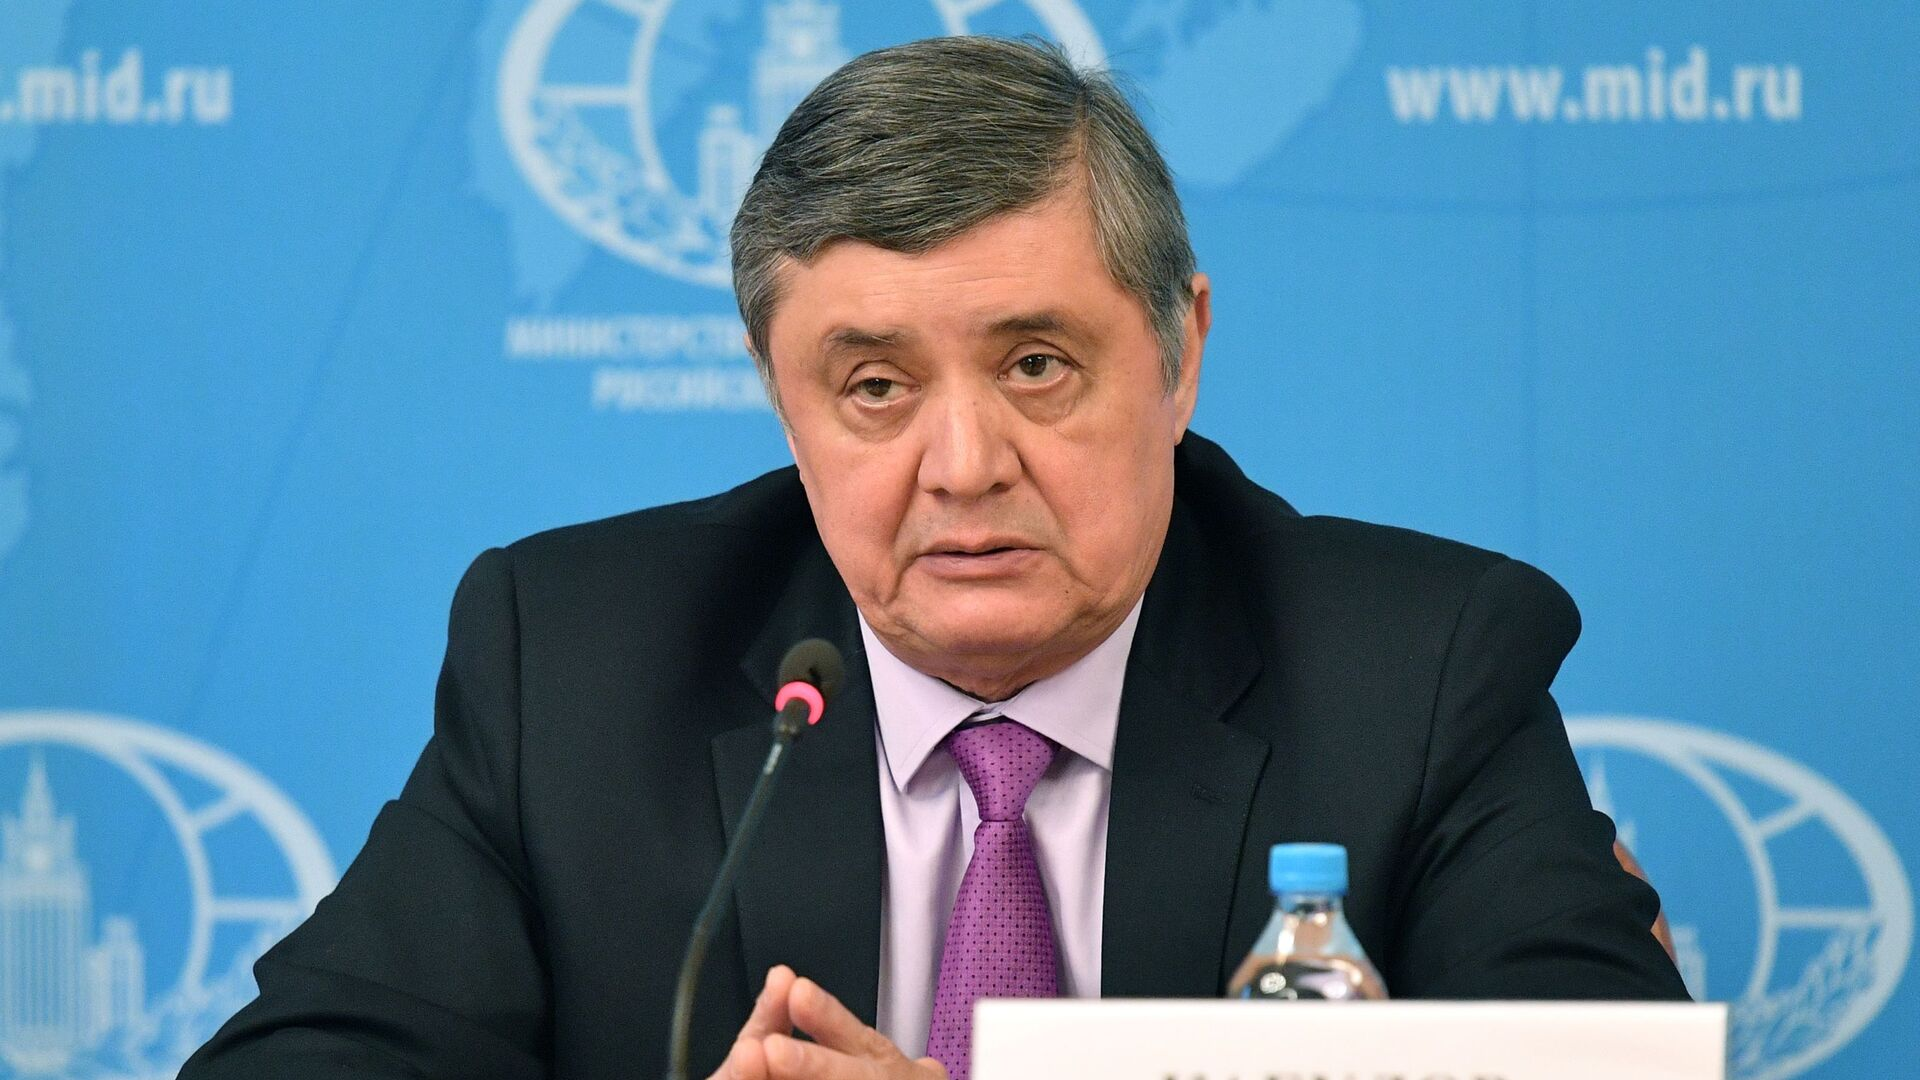 Il rappresentante speciale del presidente russo per l'Afghanistan Zamir Kabulov - Sputnik Italia, 1920, 14.07.2021